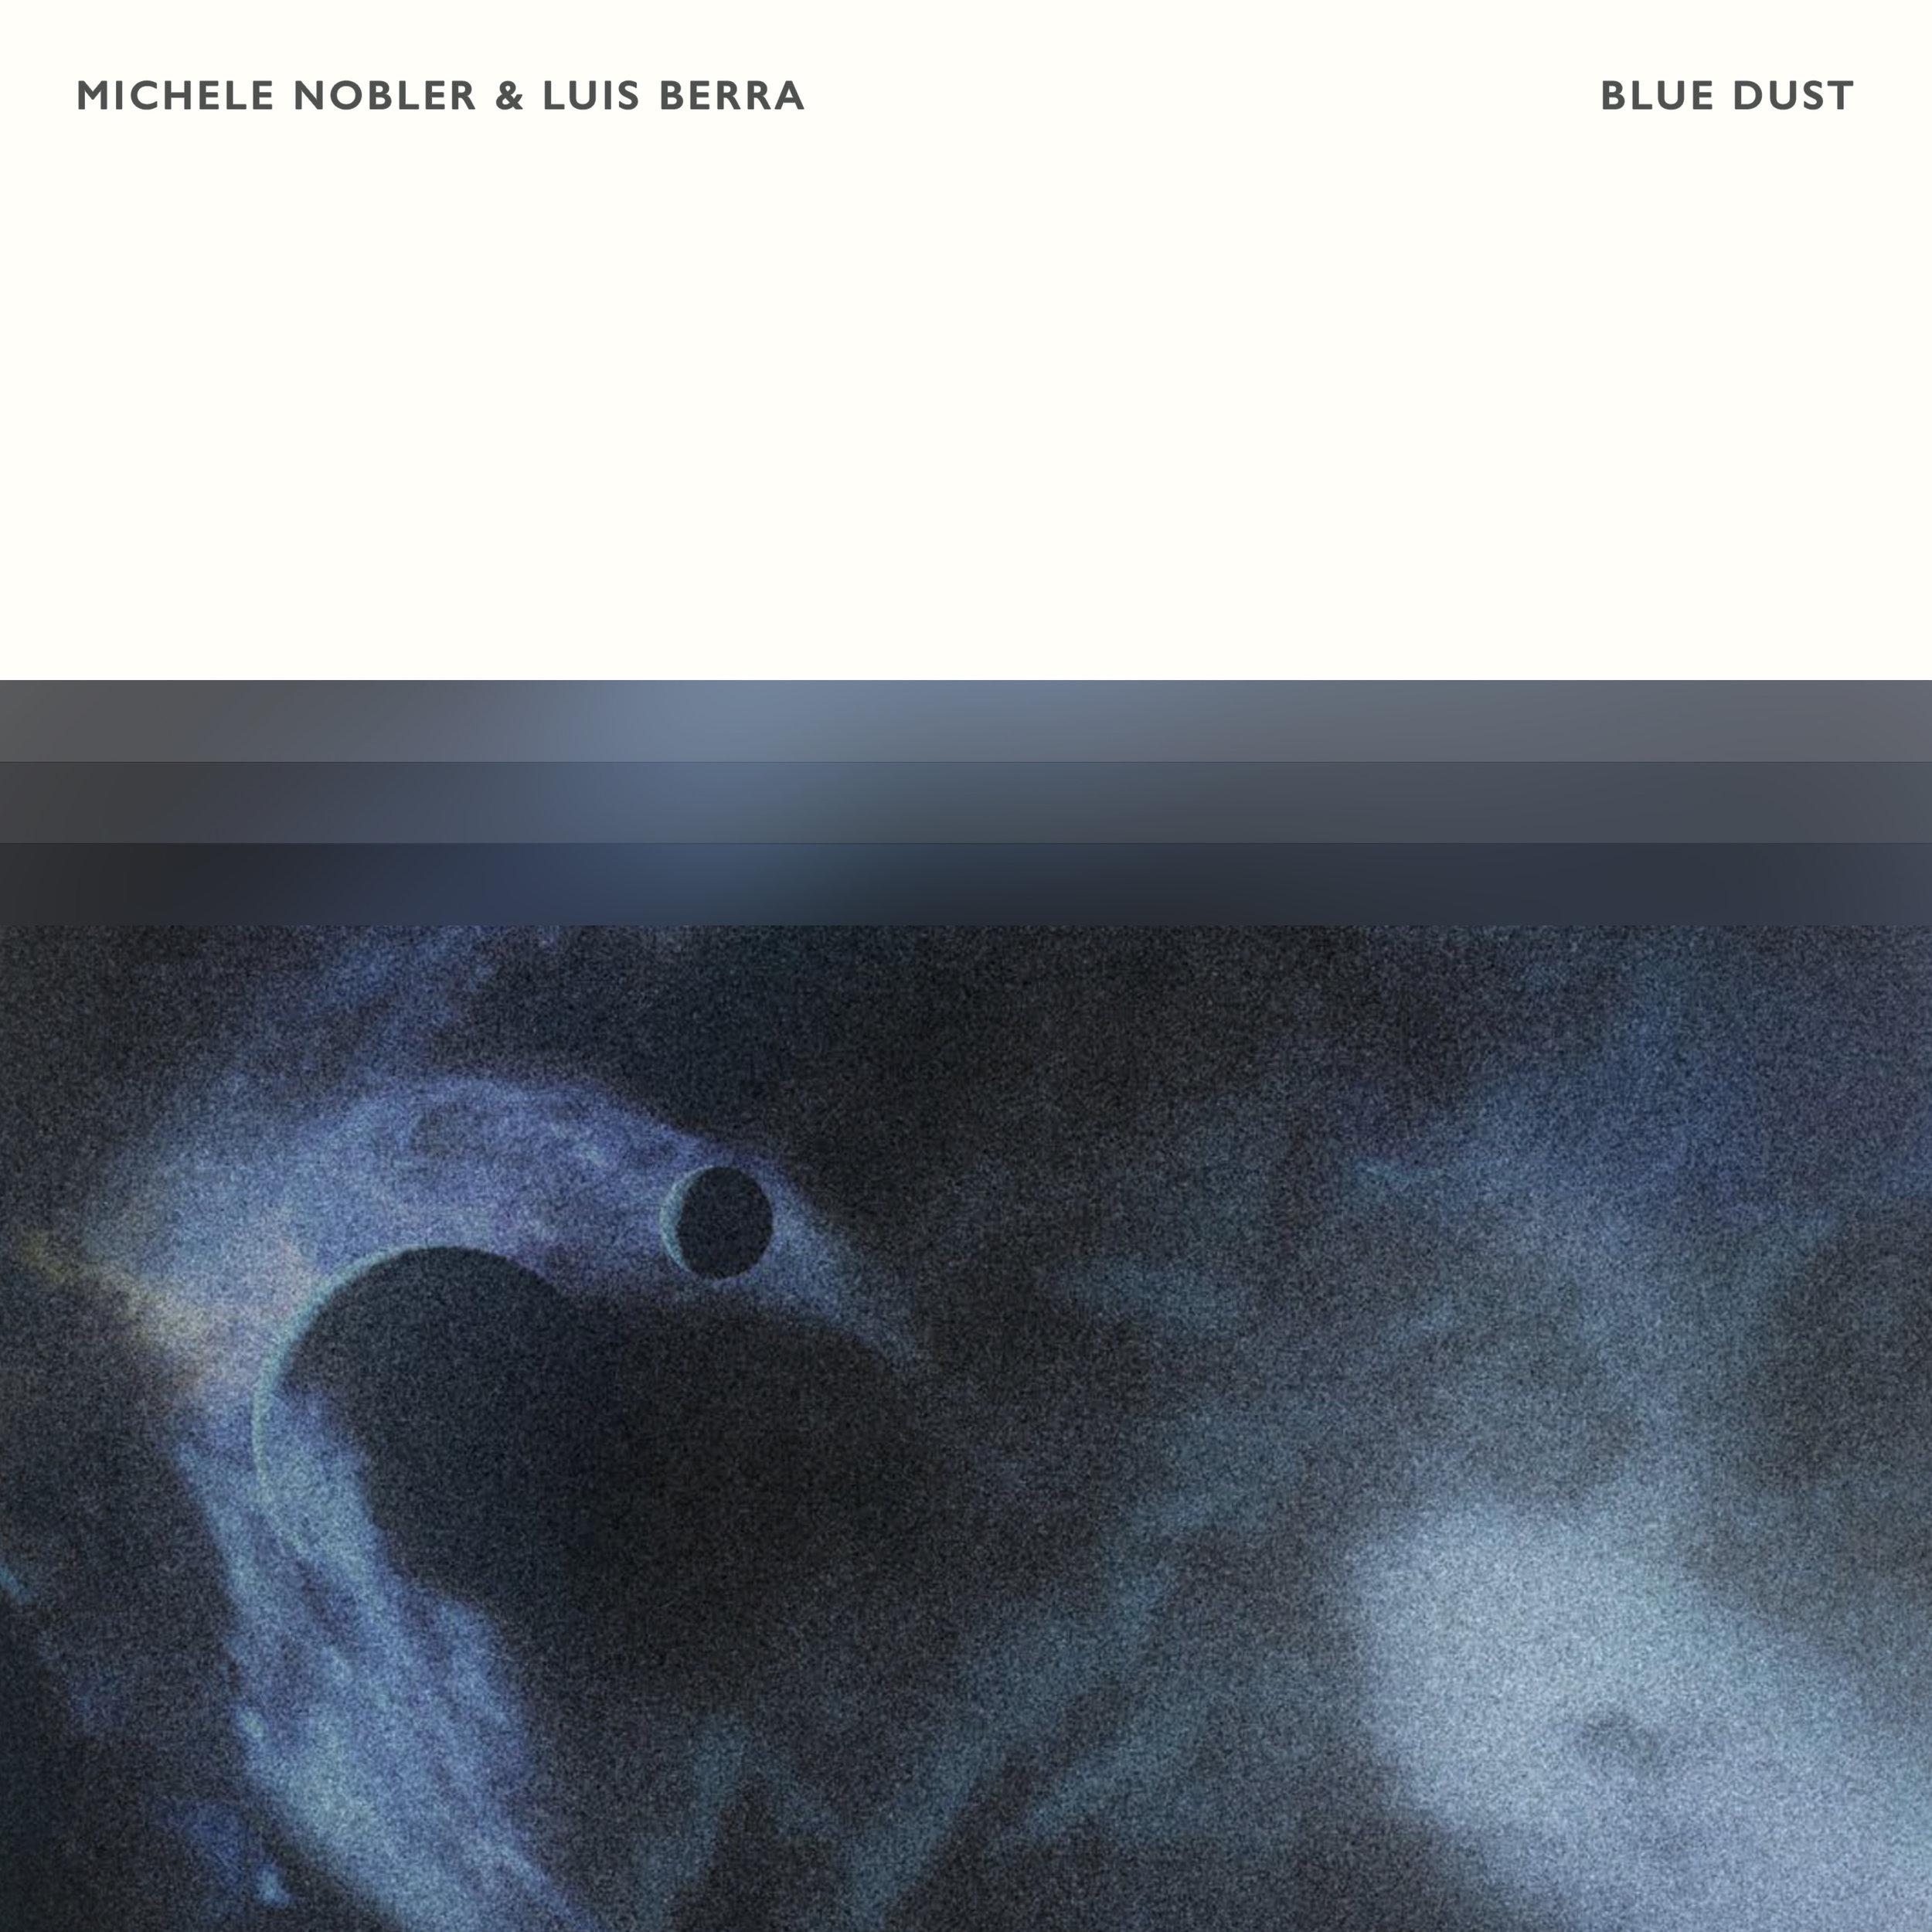 Michele Nobler & Luis Berra - Blue Dust